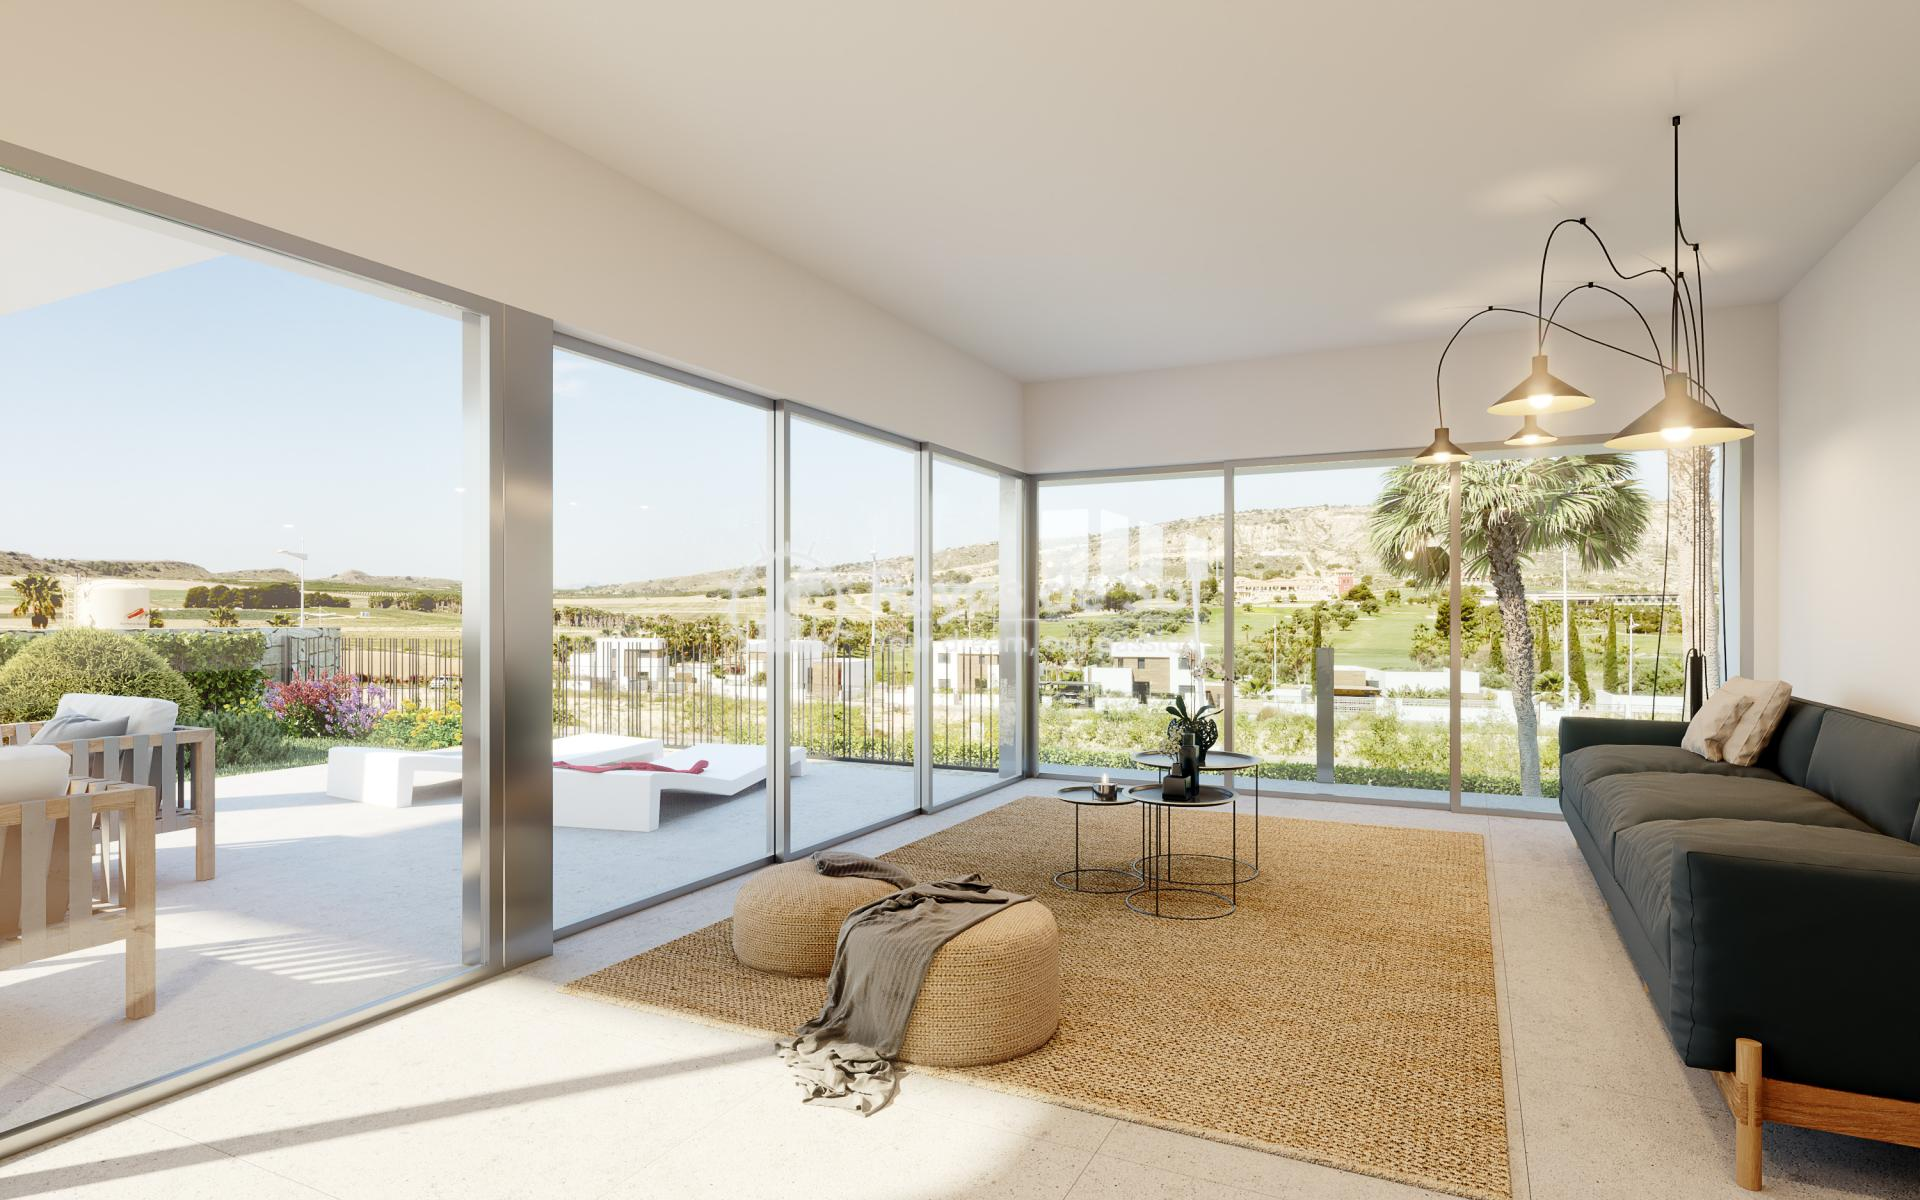 Luxury newbuild villa in La Finca Golf, Algorfa, Costa Blanca (LFPADI) - 10